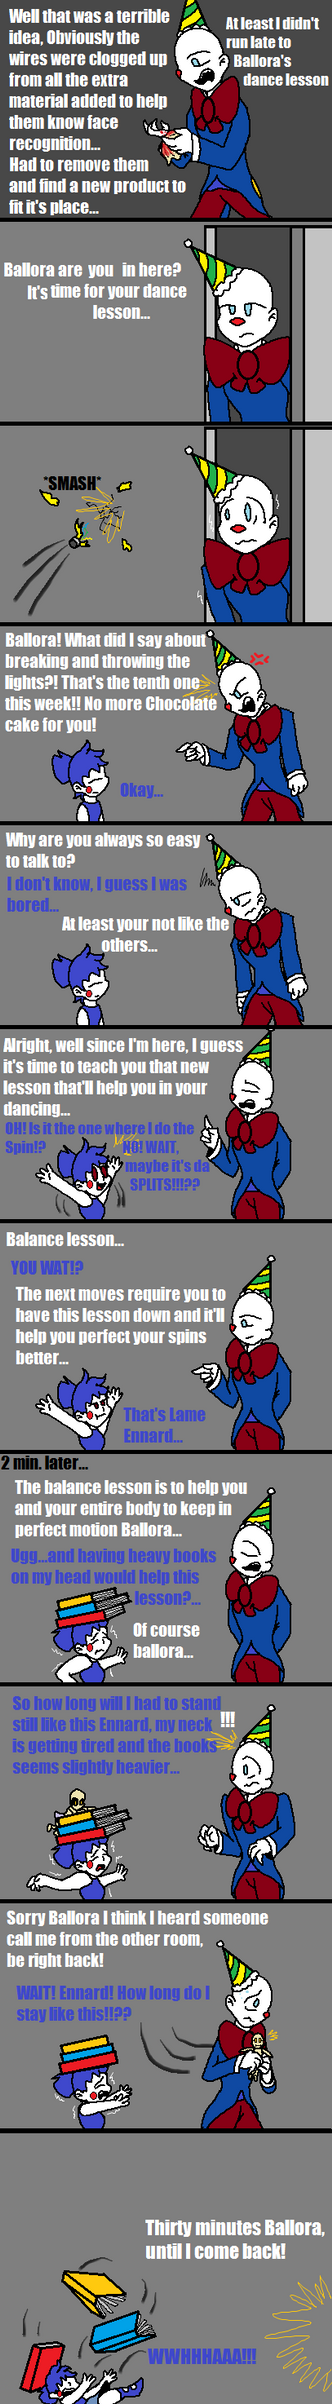 Dancing Lessons (FNAF Comic) by Blustreakgirl